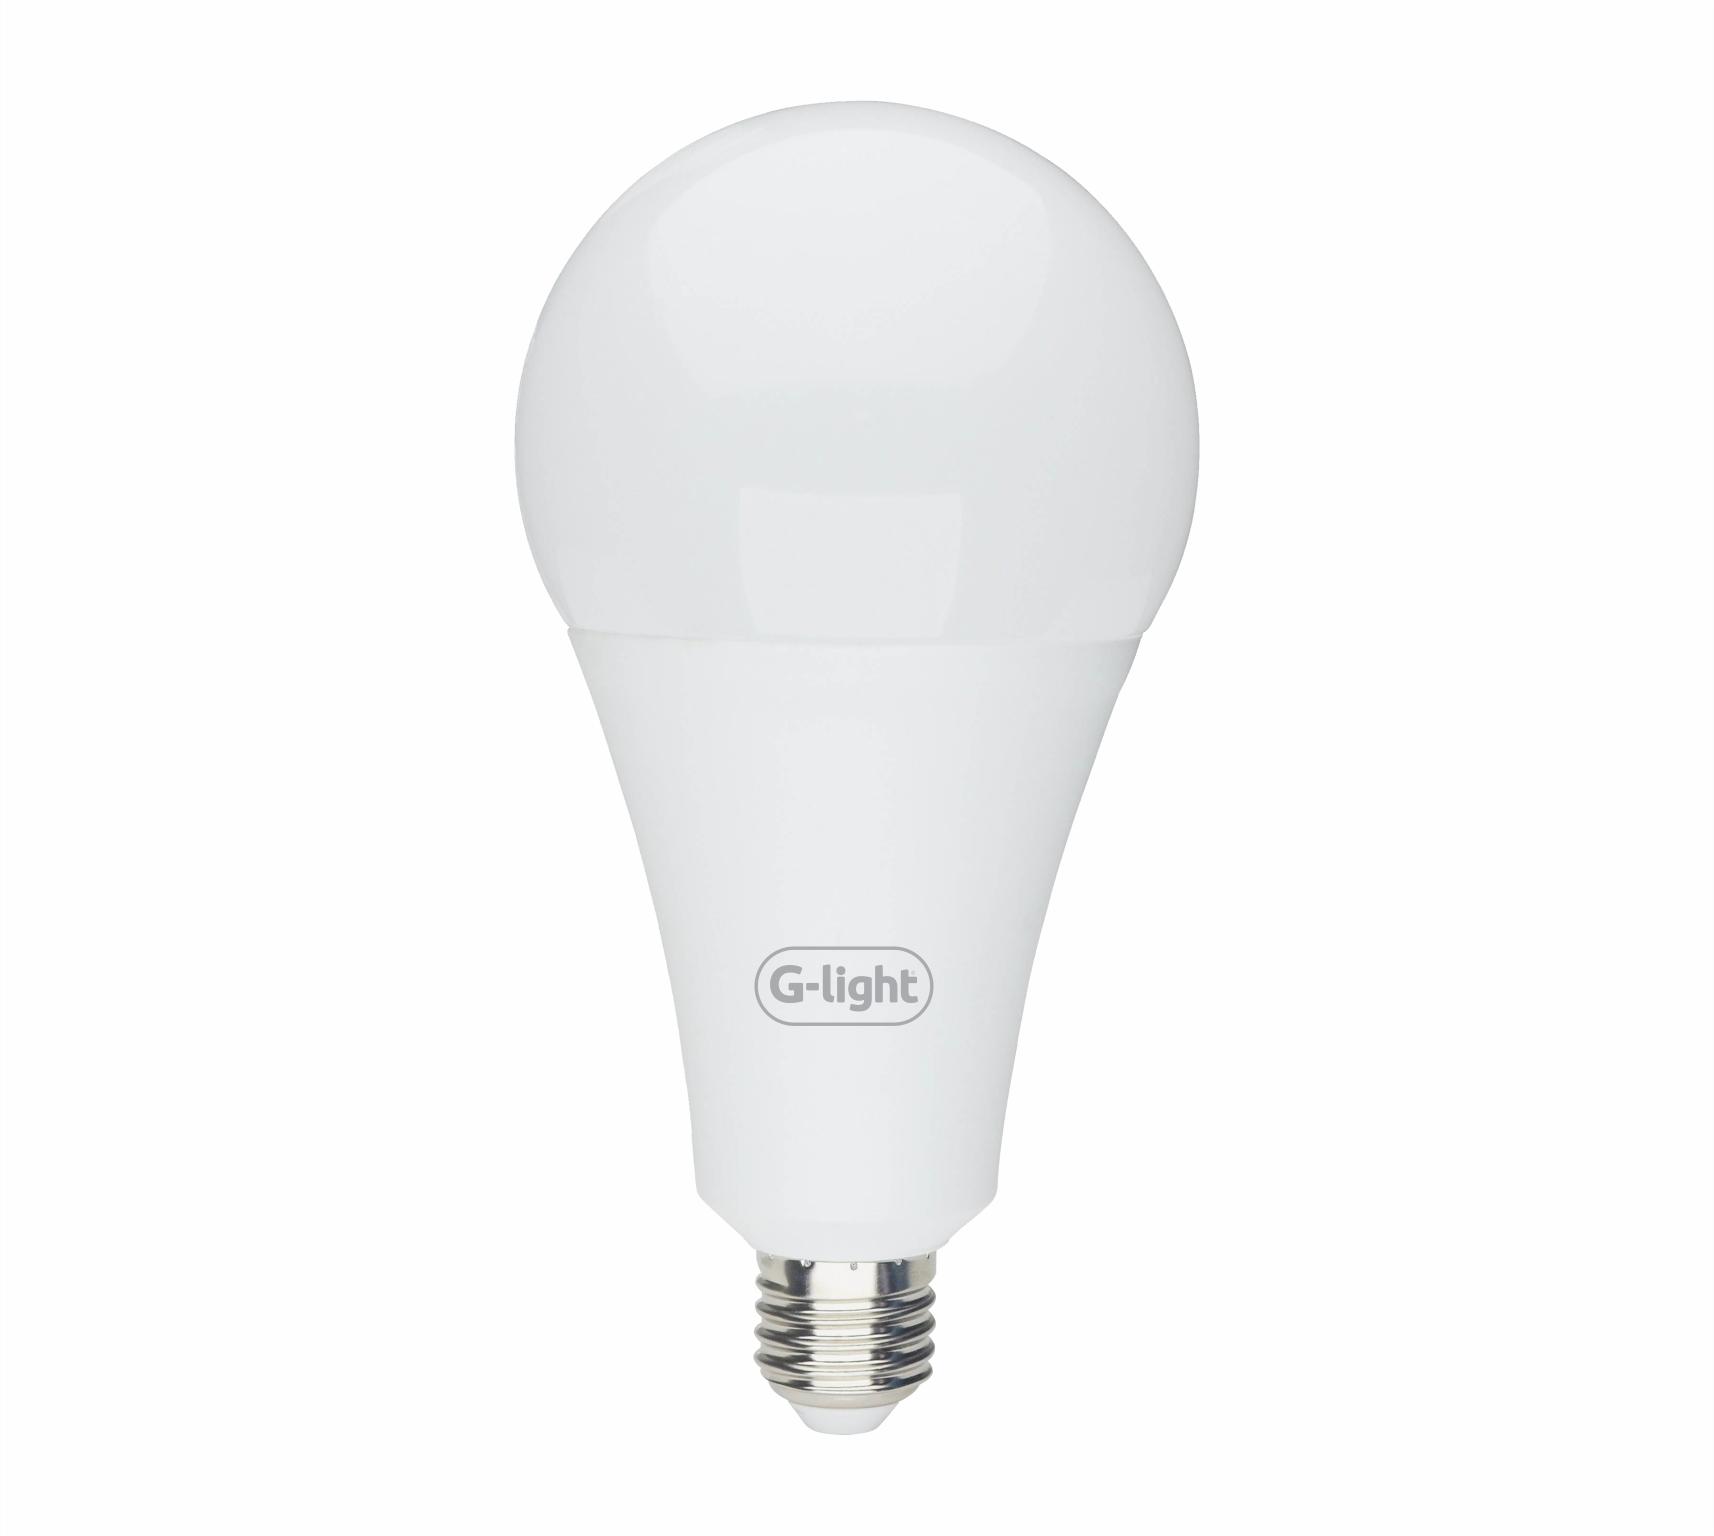 A95-LED-E27-30-65-3C <span>(caixa)</span><br/>